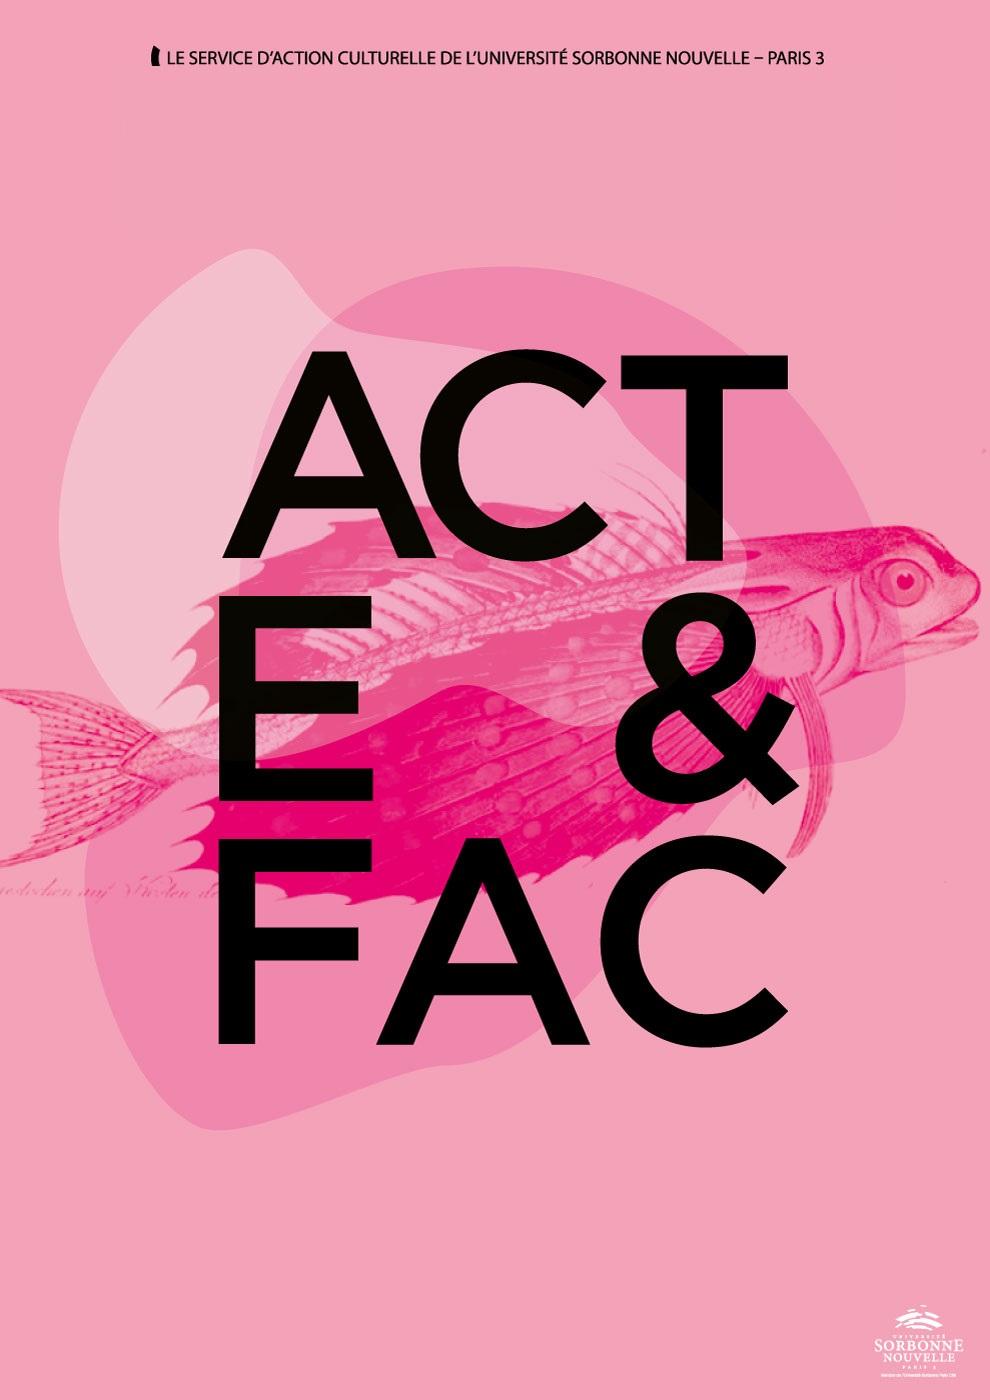 ACTEFAC sans festival.jpg